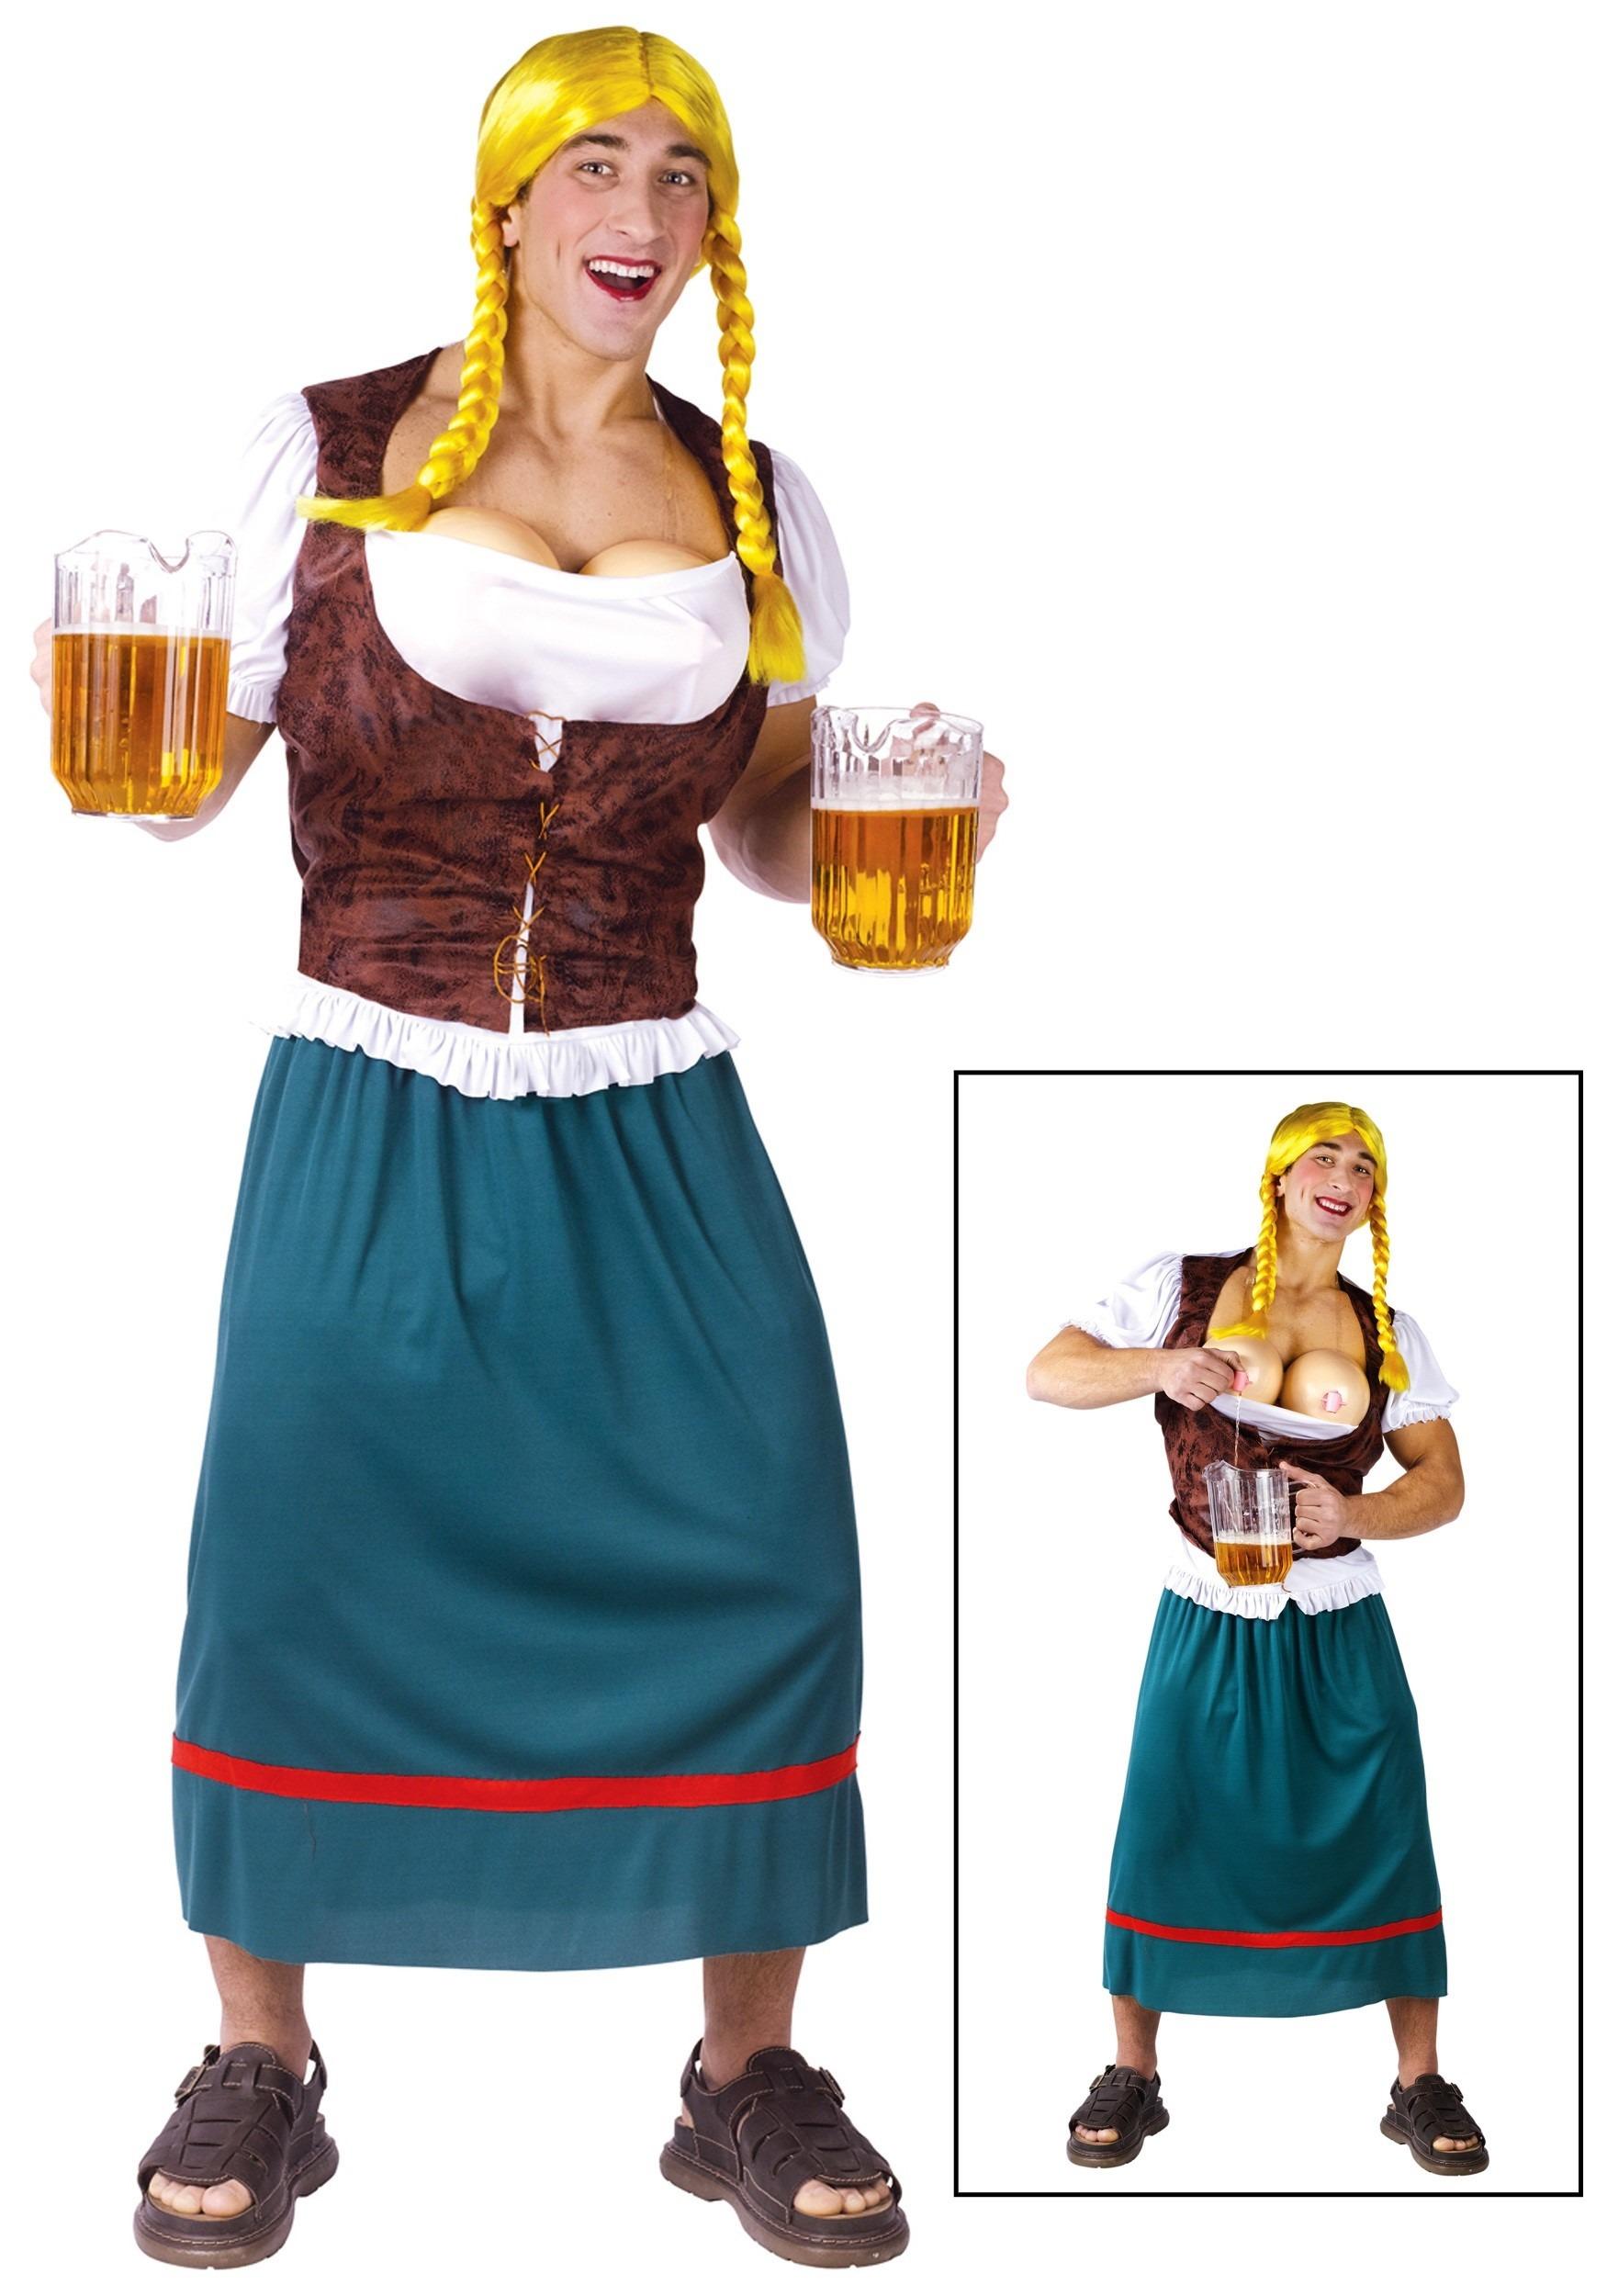 Adult Humor Costumes Adult Humor Halloween Costume